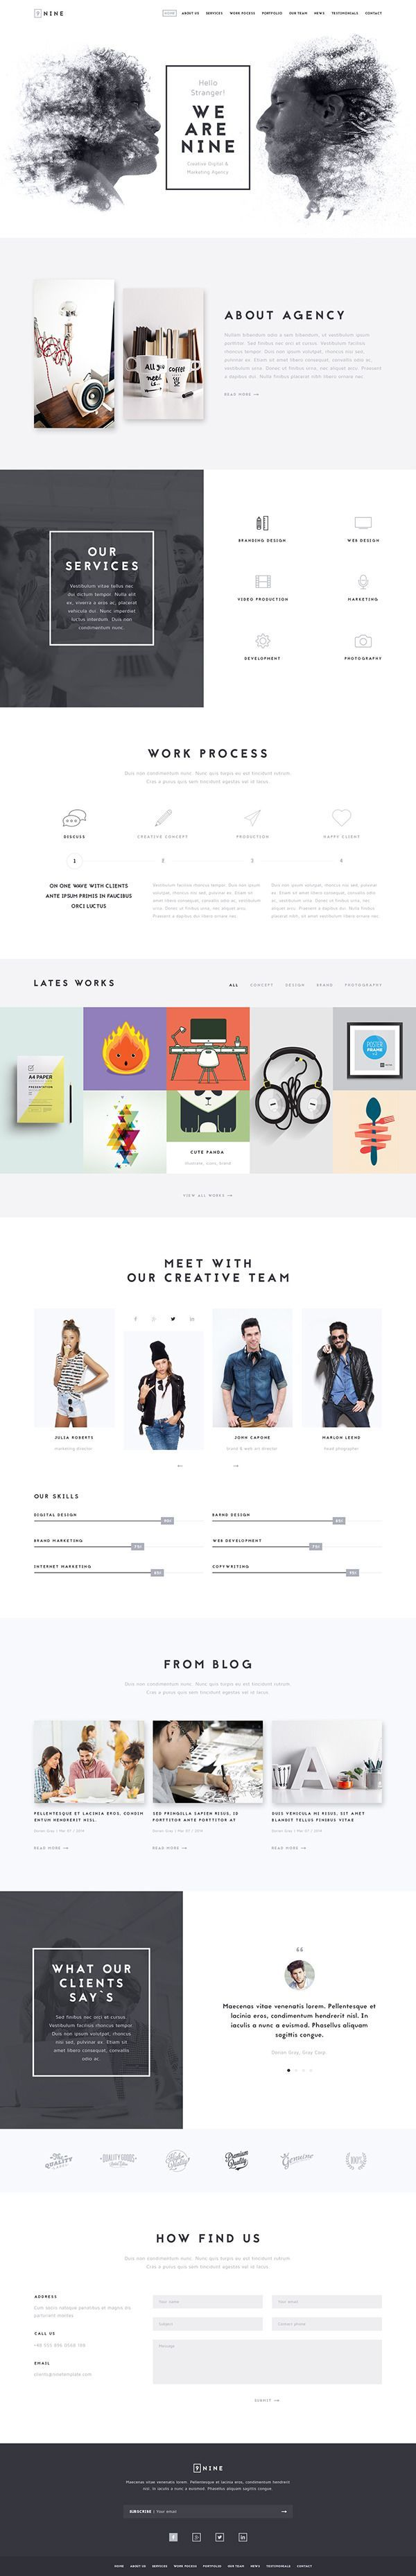 Creative Website Designs By Themes Awards San Francisco Ca Usa Wordpressawards Behance Creative Website Design Web Design Web Layout Design